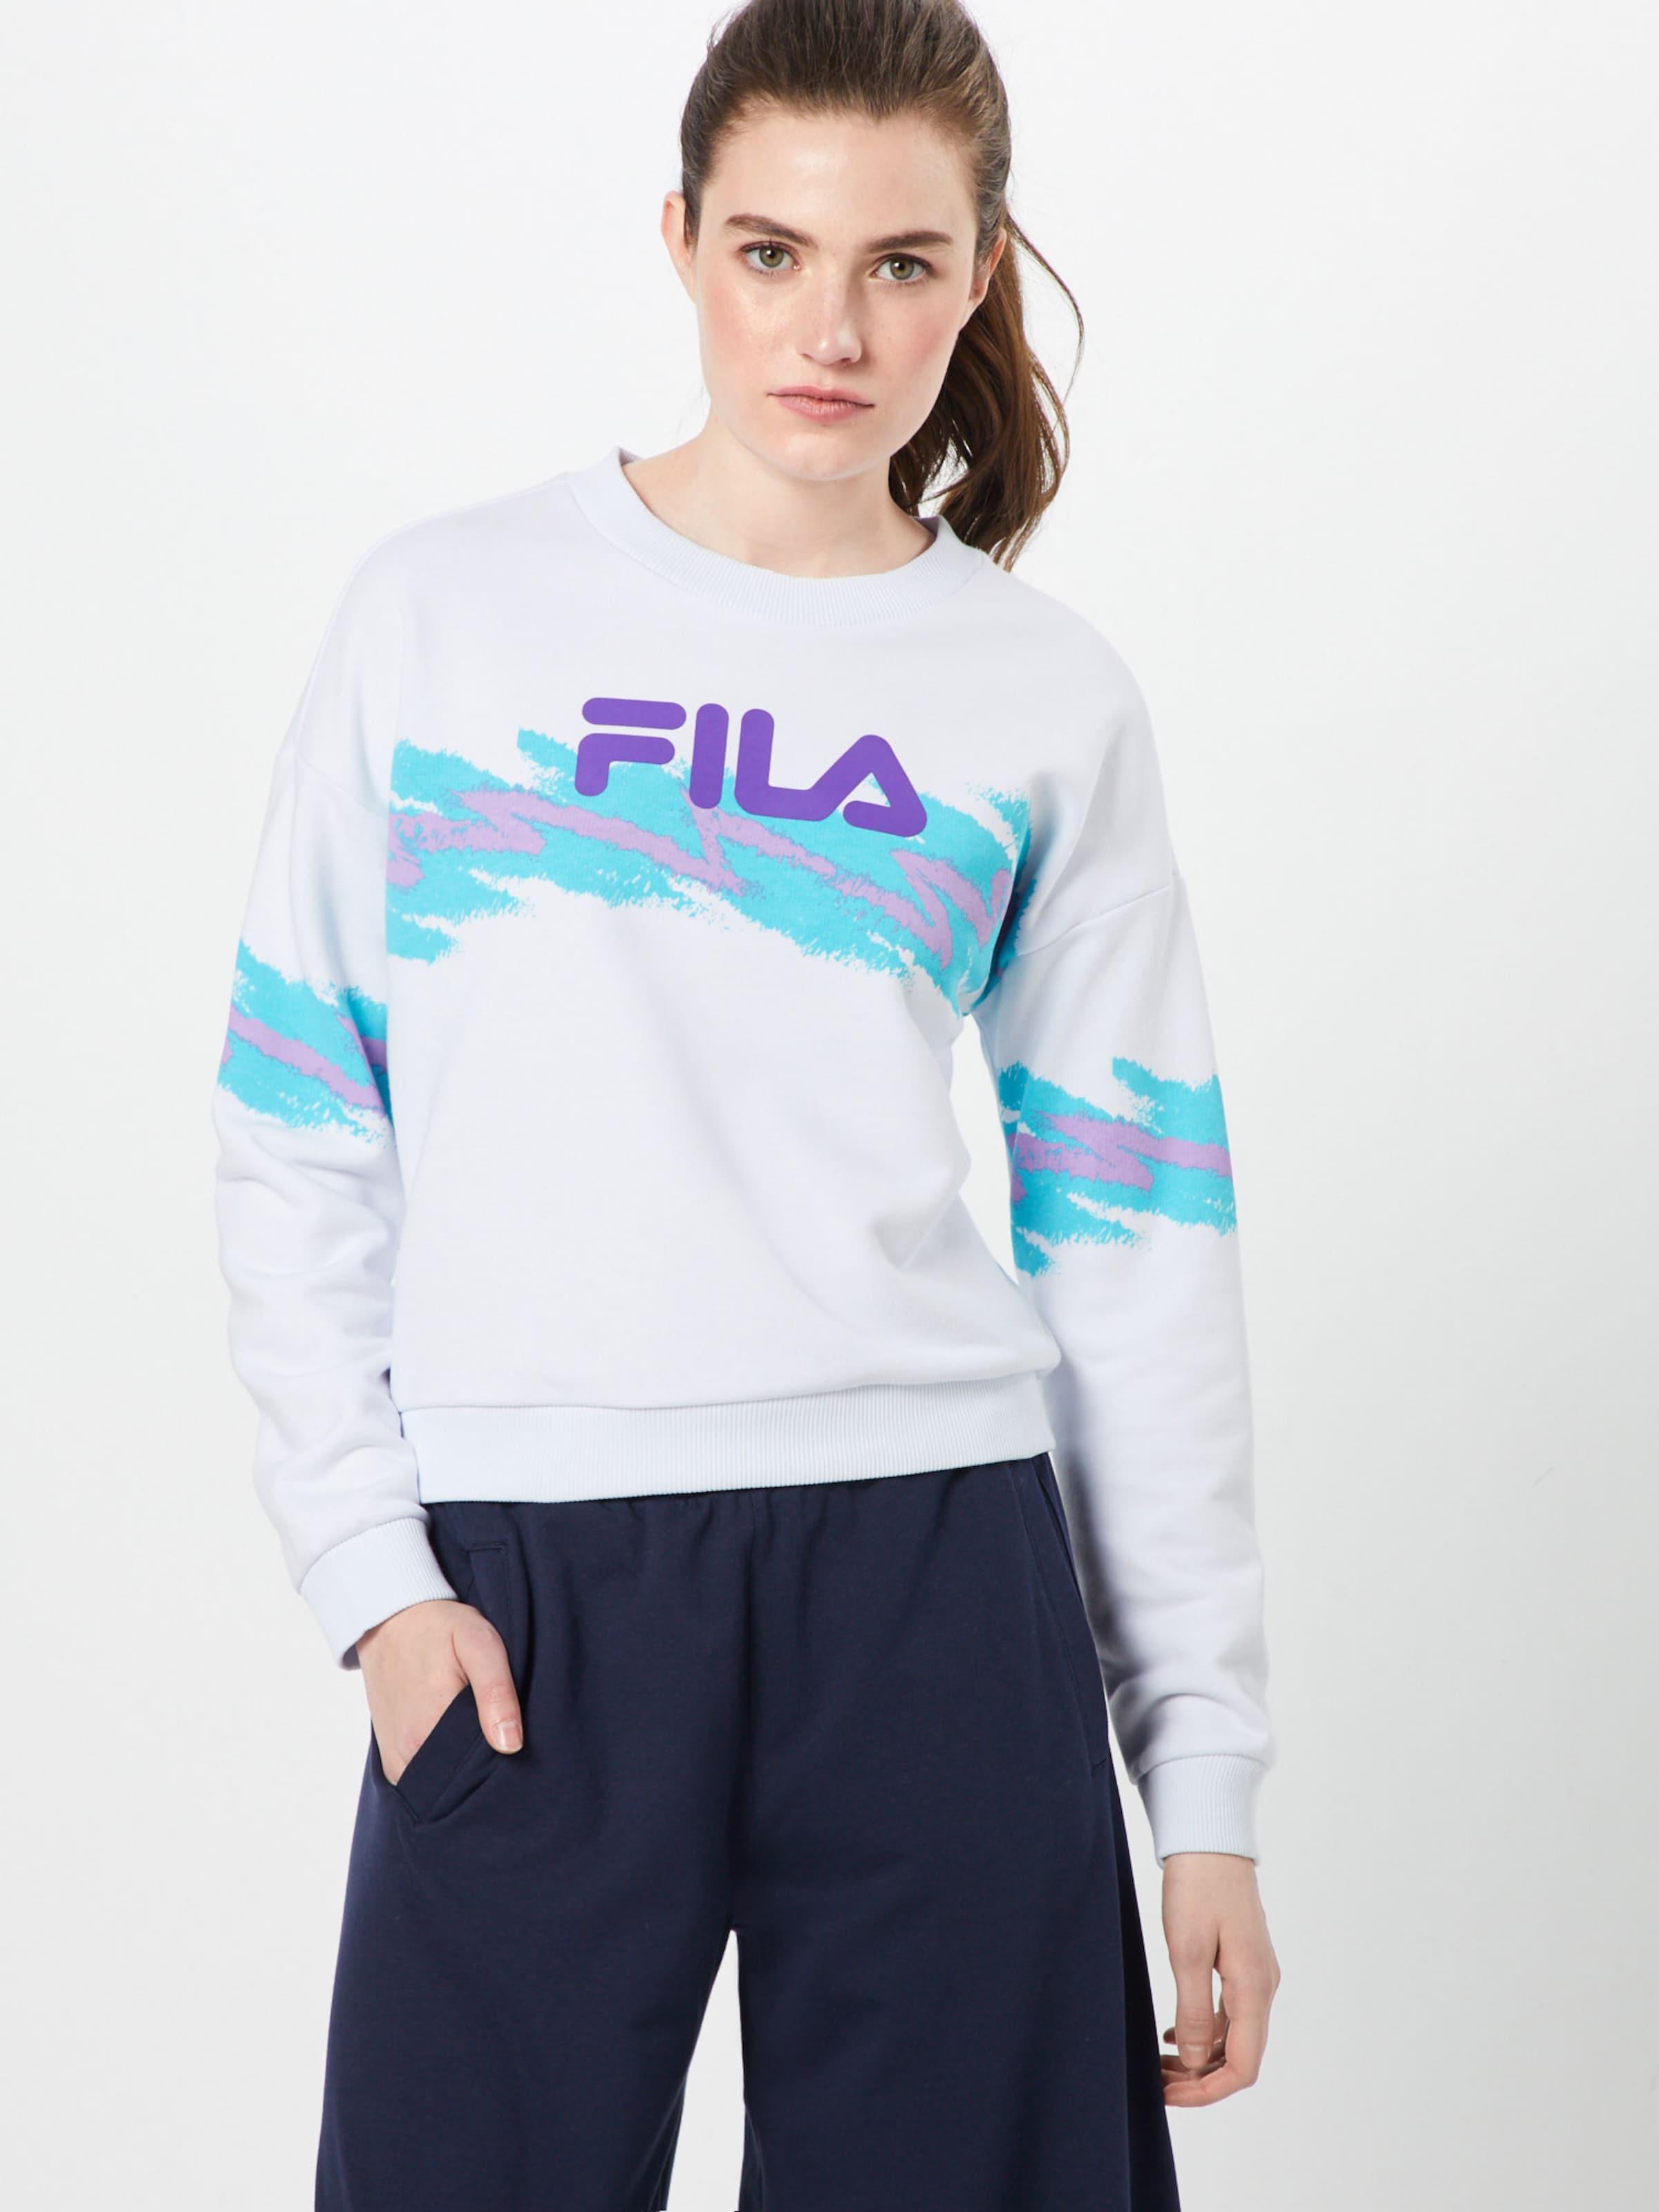 Sweat Fila Crew' shirt TurquoiseBlanc En Buttoned 'justyna vf7yYgb6